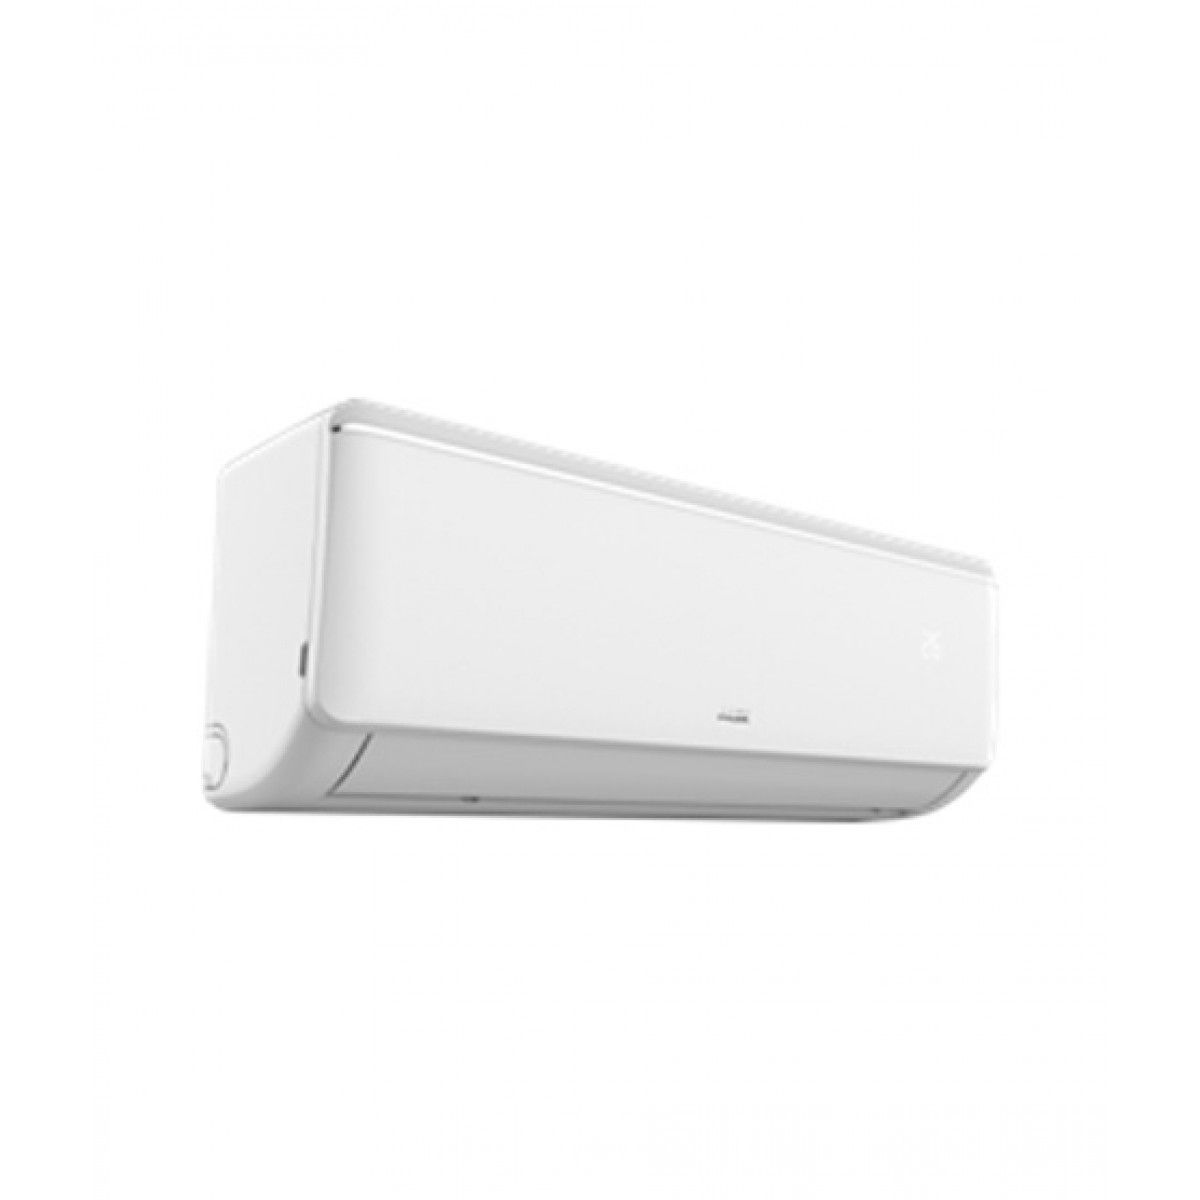 PEL Majestic E52 Split Air Conditioner 2.0 Ton (PSAC-24K)